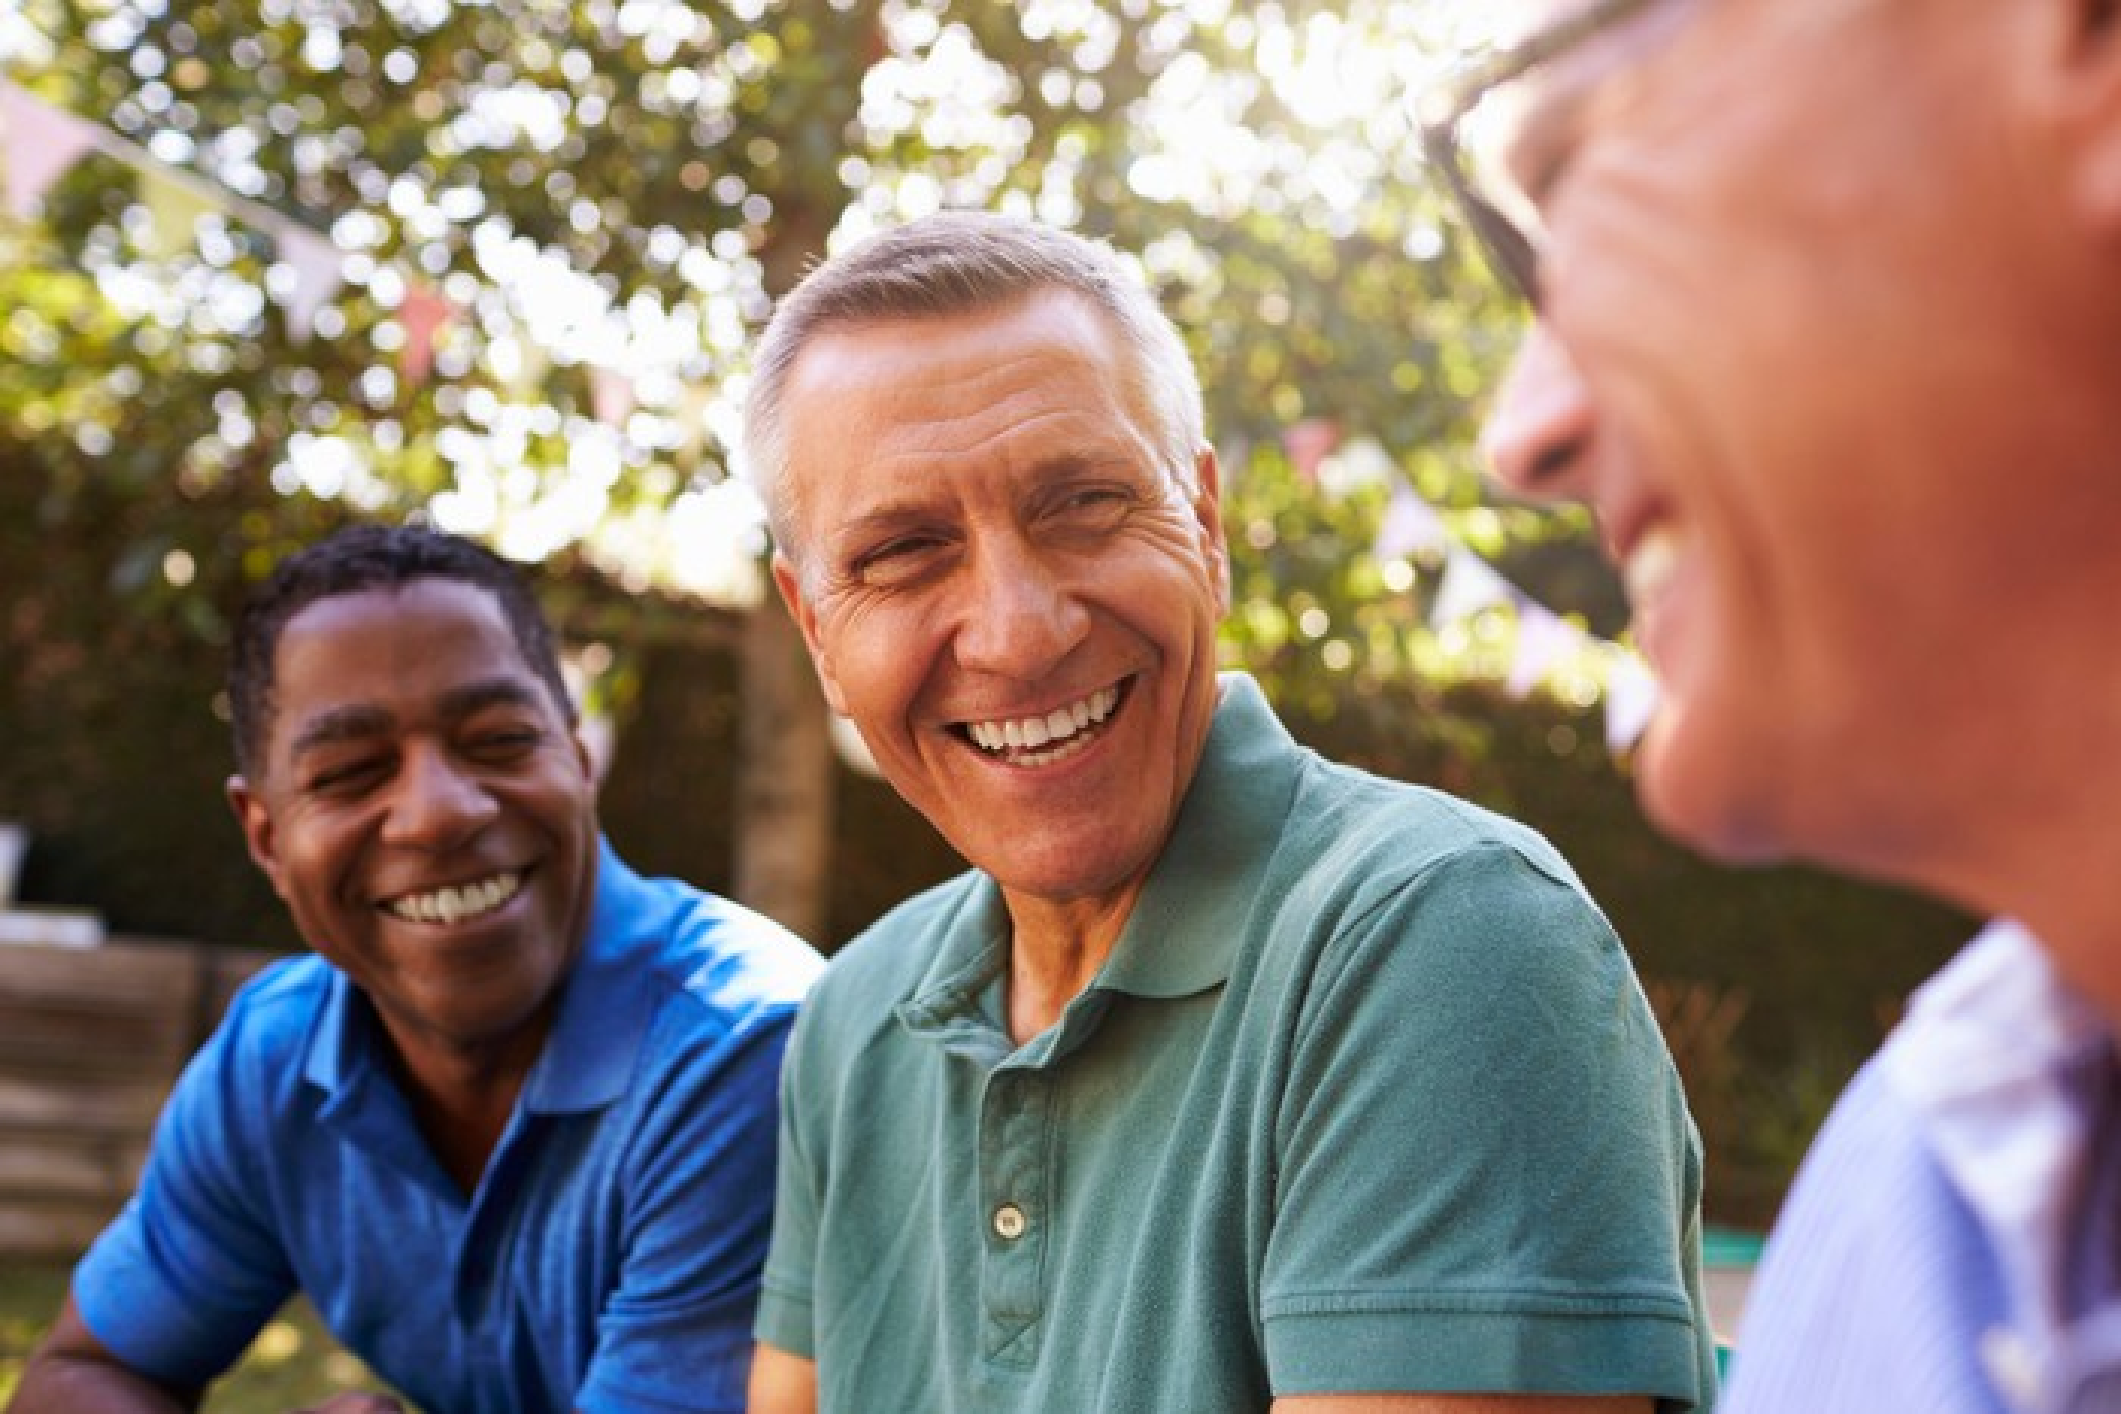 Smiling middle-aged men